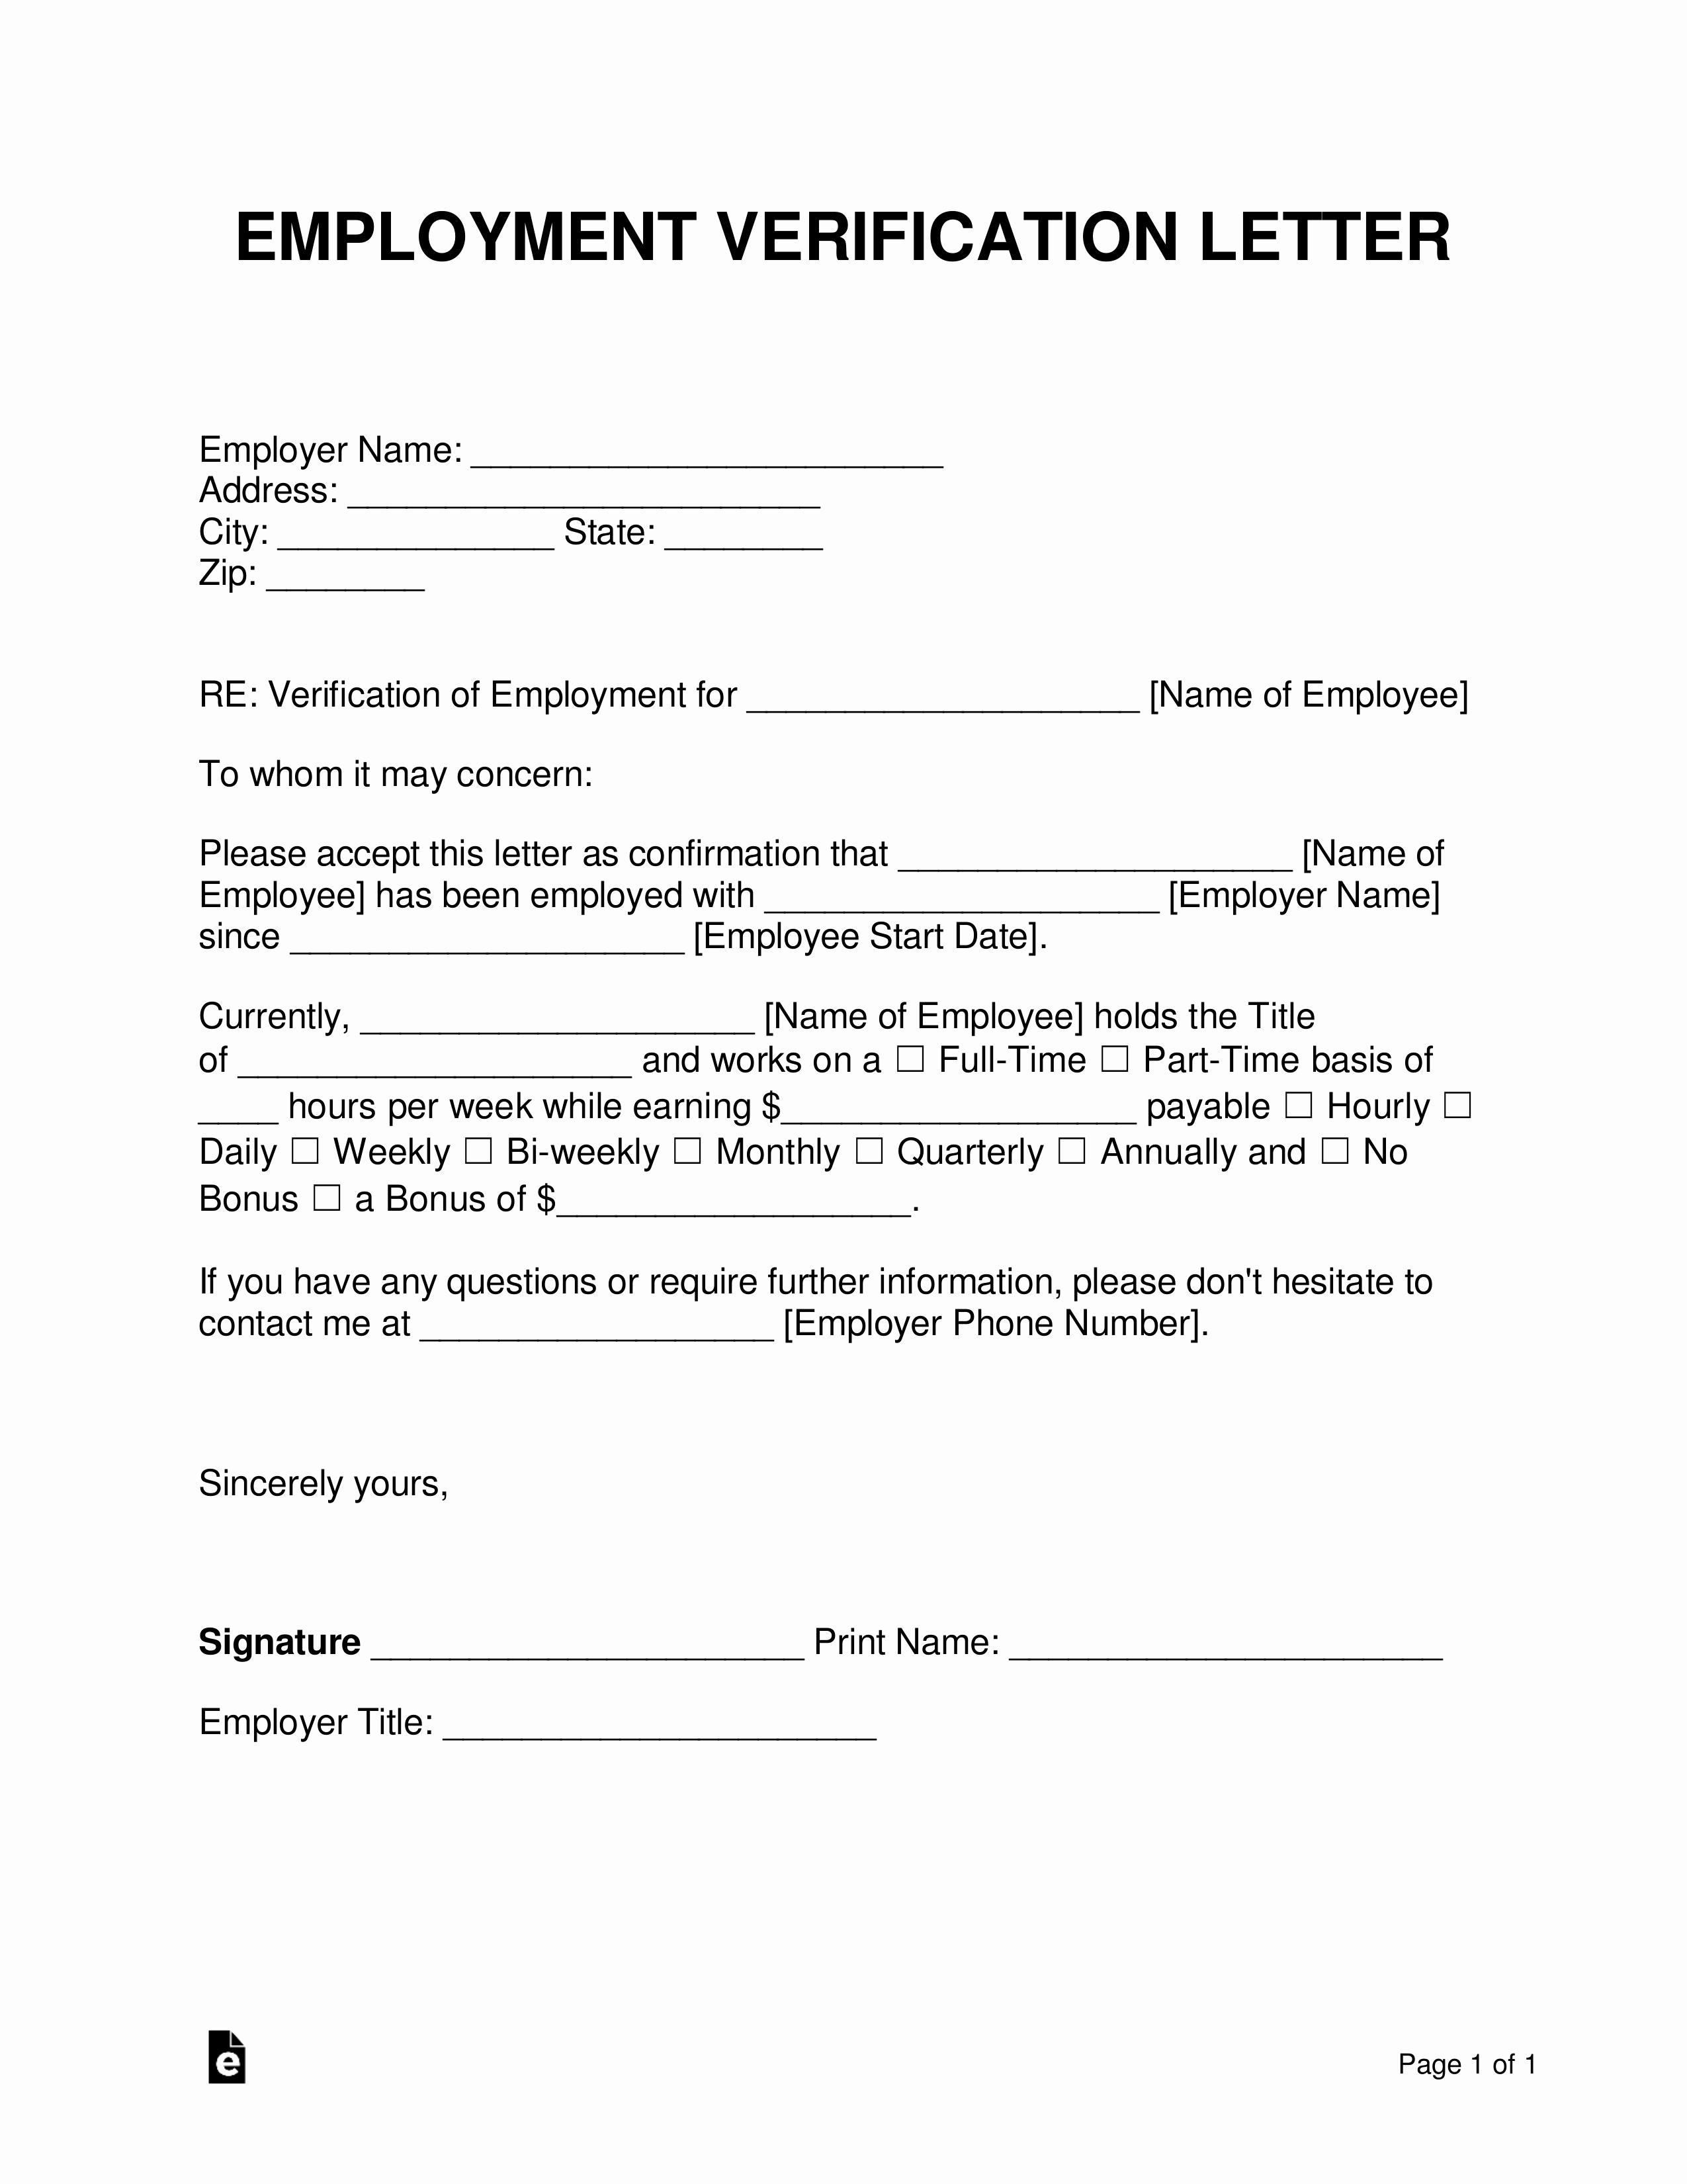 Employment Verification form Template Elegant Free Employment In E Verification Letter Pdf